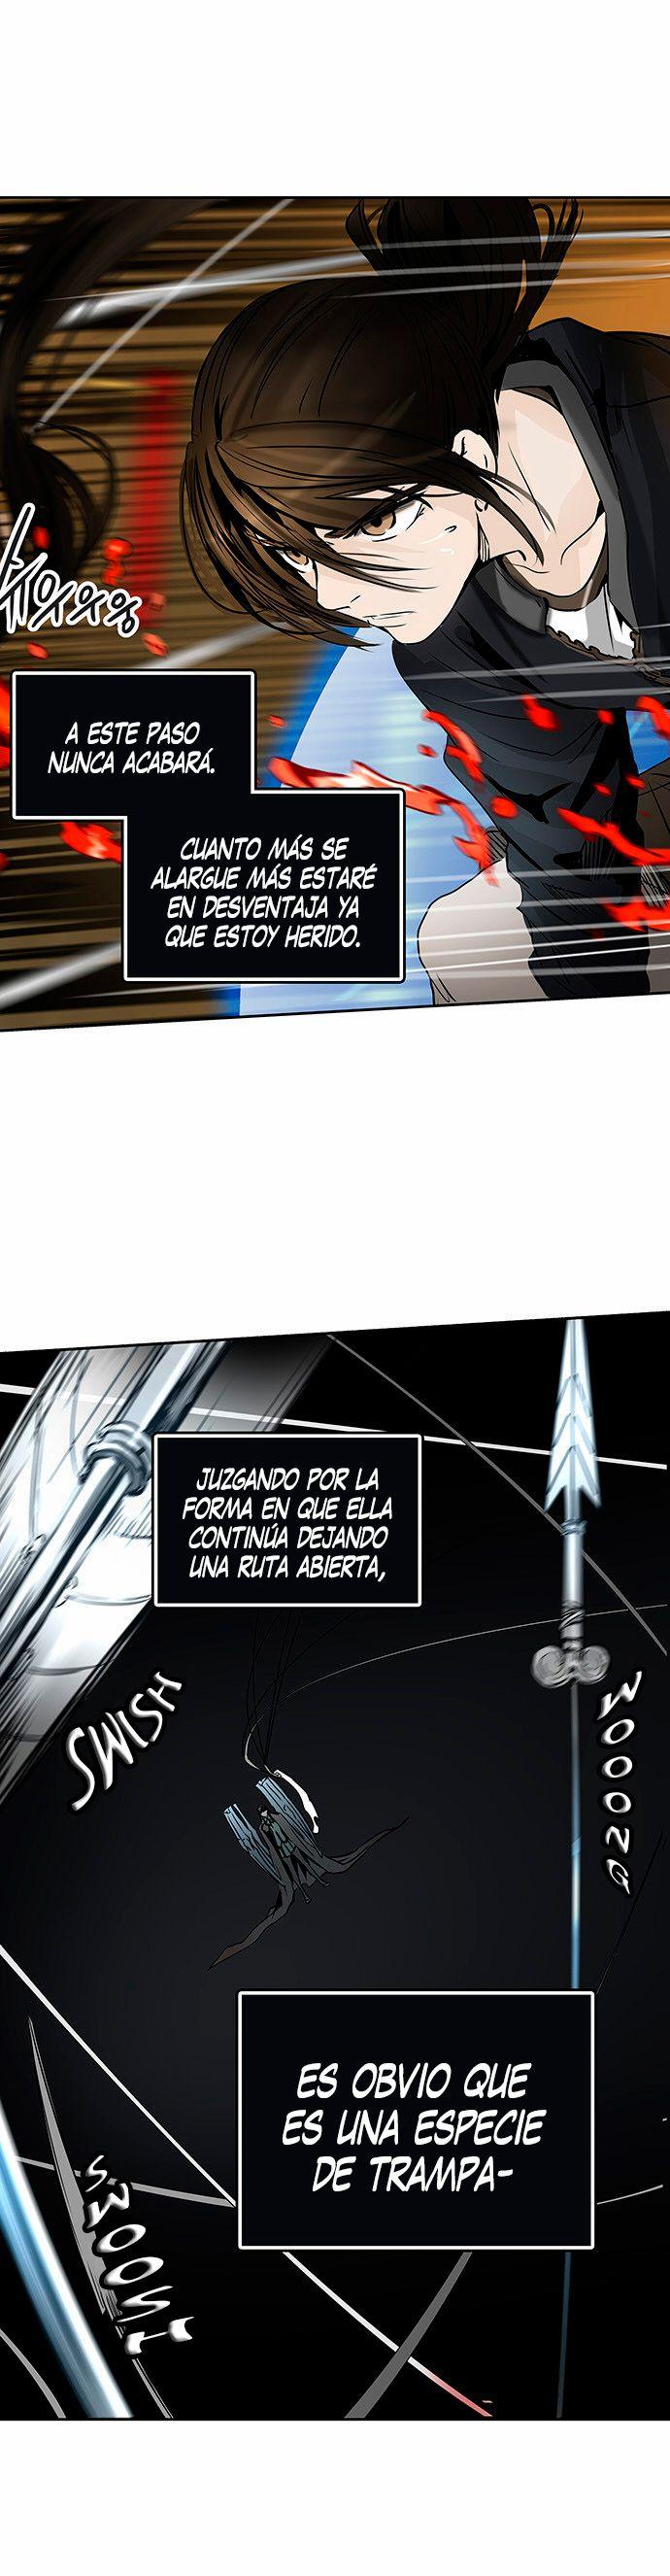 http://c5.ninemanga.com/es_manga/pic2/21/149/510638/d185049b603d66fce0824715d9d57fb2.jpg Page 3